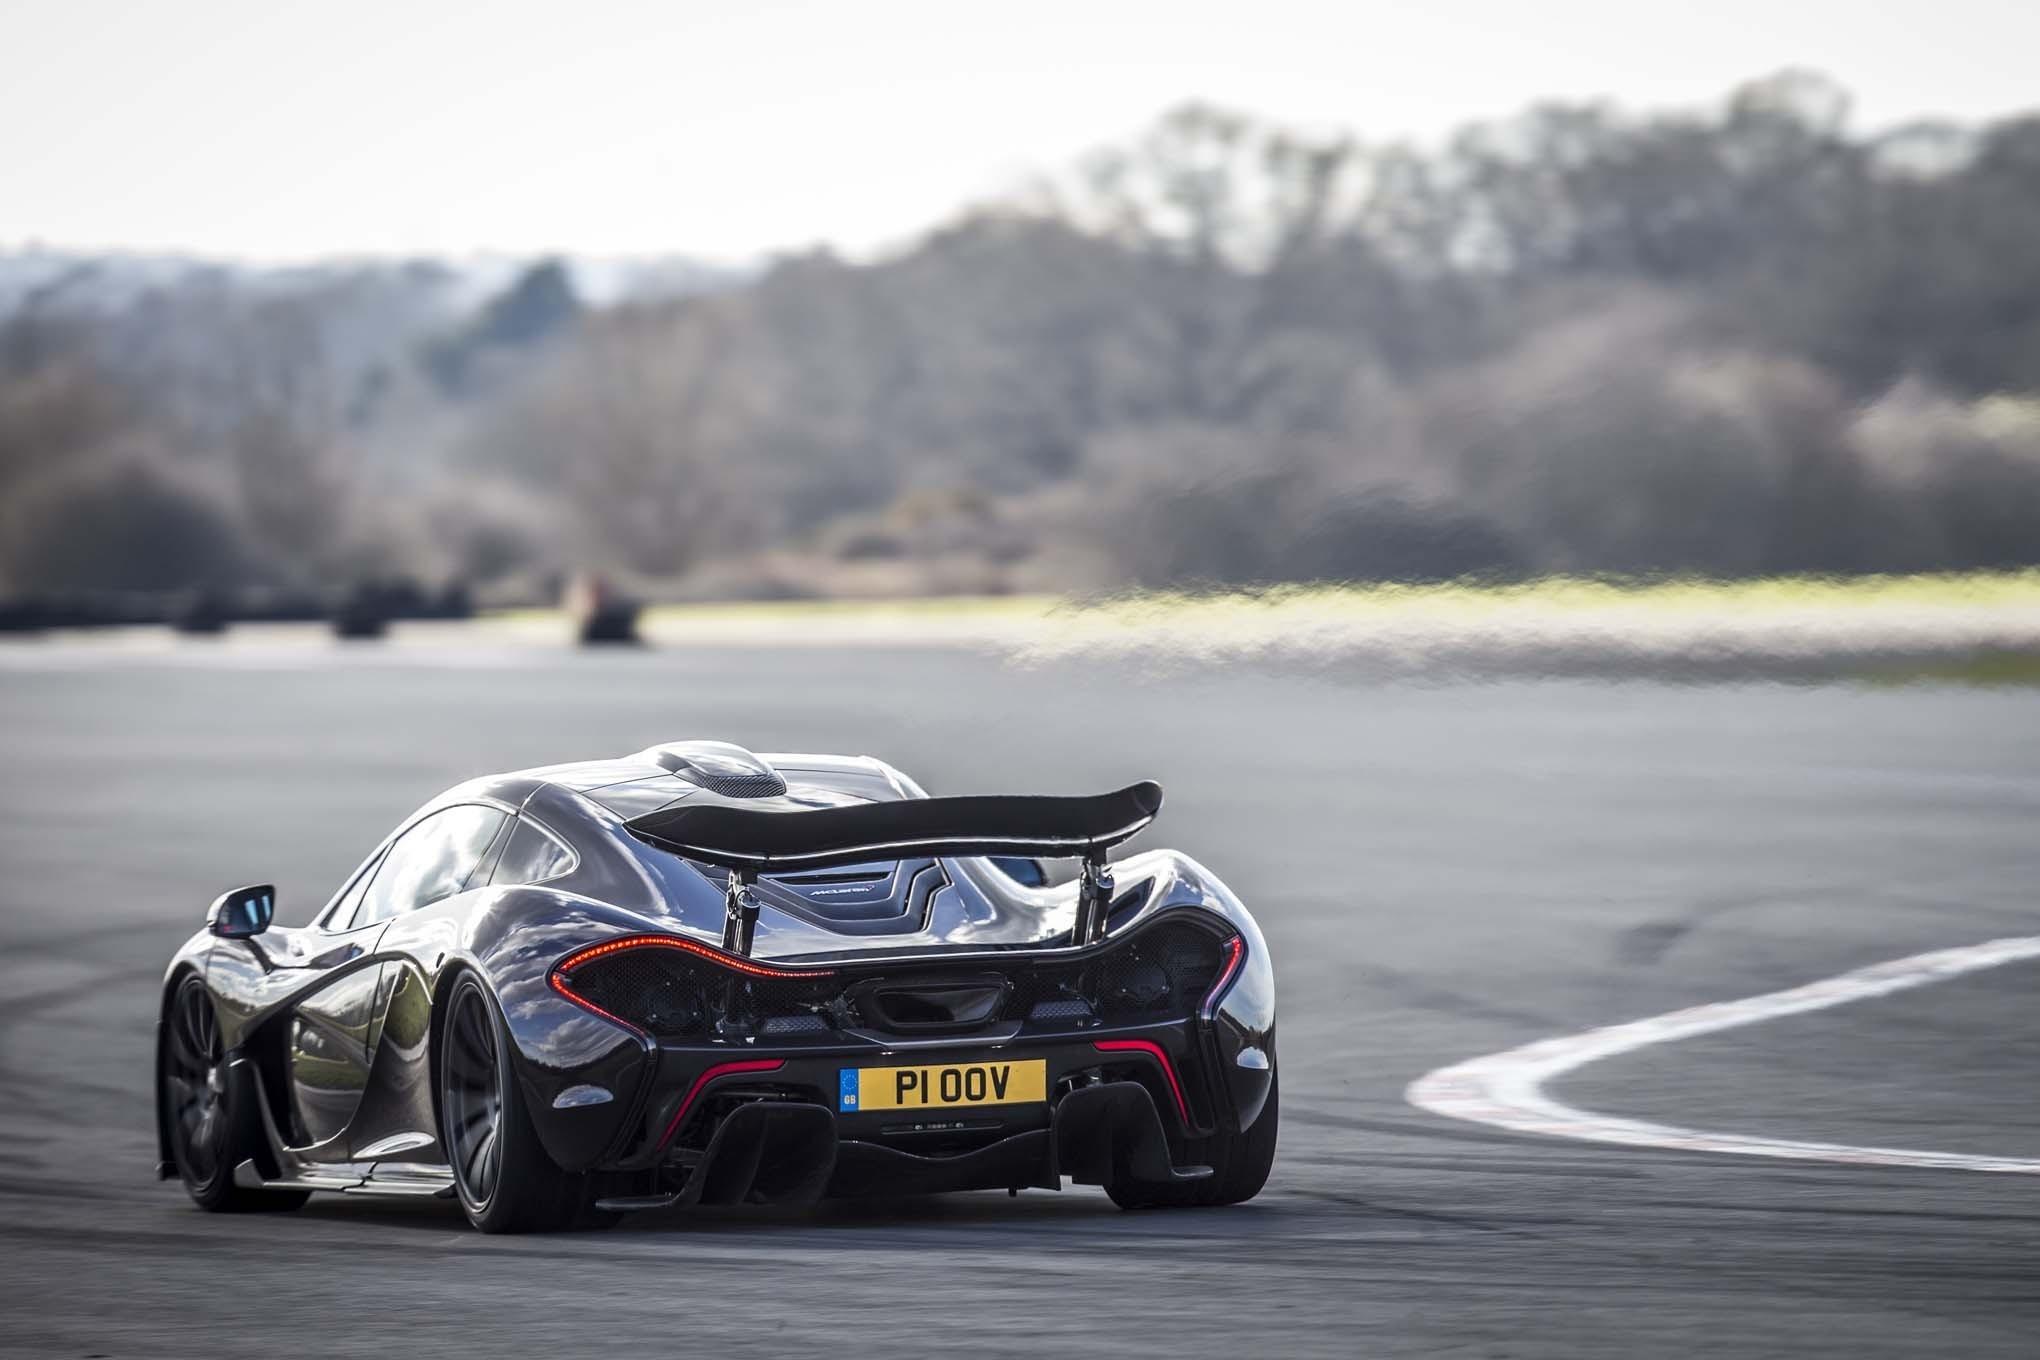 Res: 2040x1360, Car Wallpapers. Download the following McLaren P1 ...